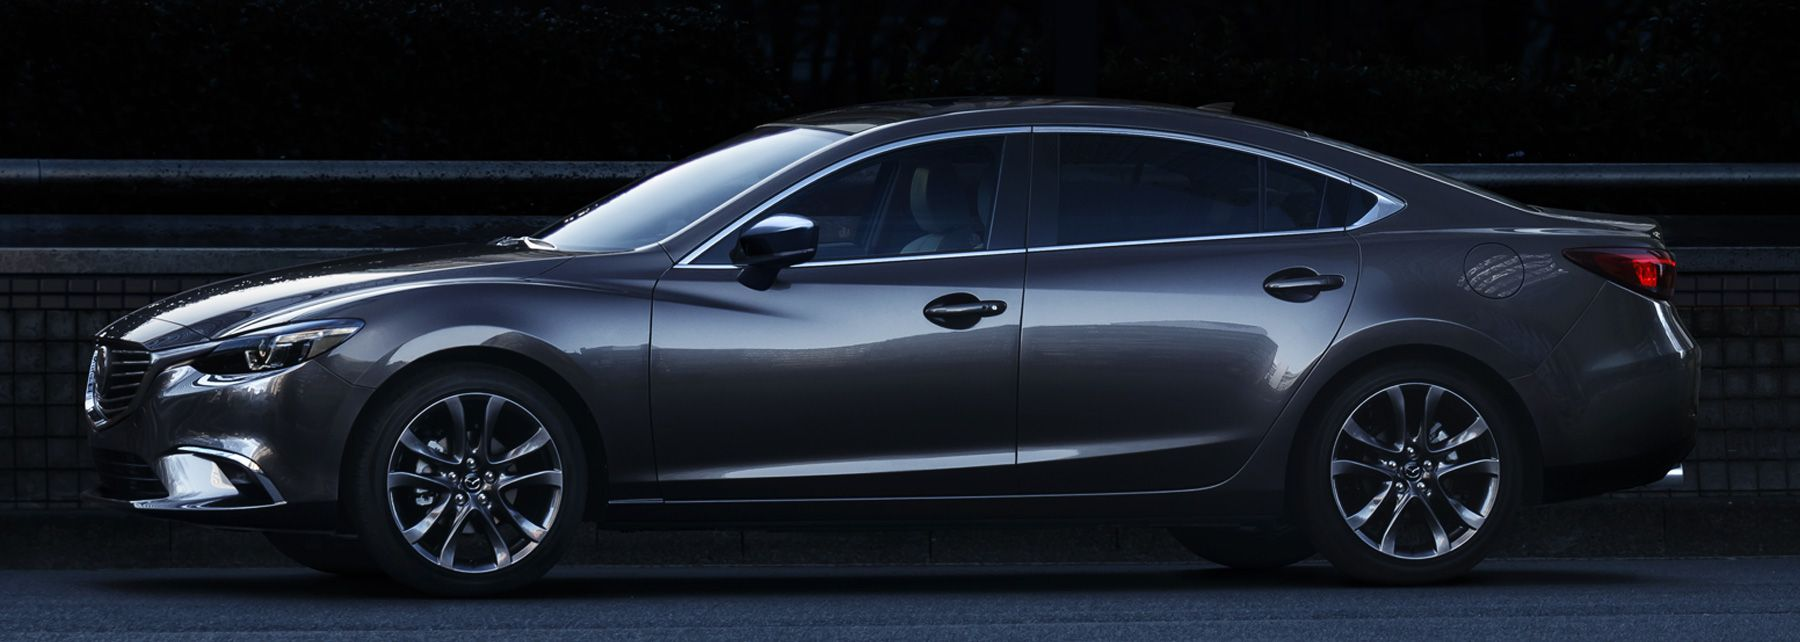 2017 Mazda6 Vs 2017 Chevy Malibu Near Columbia, SC